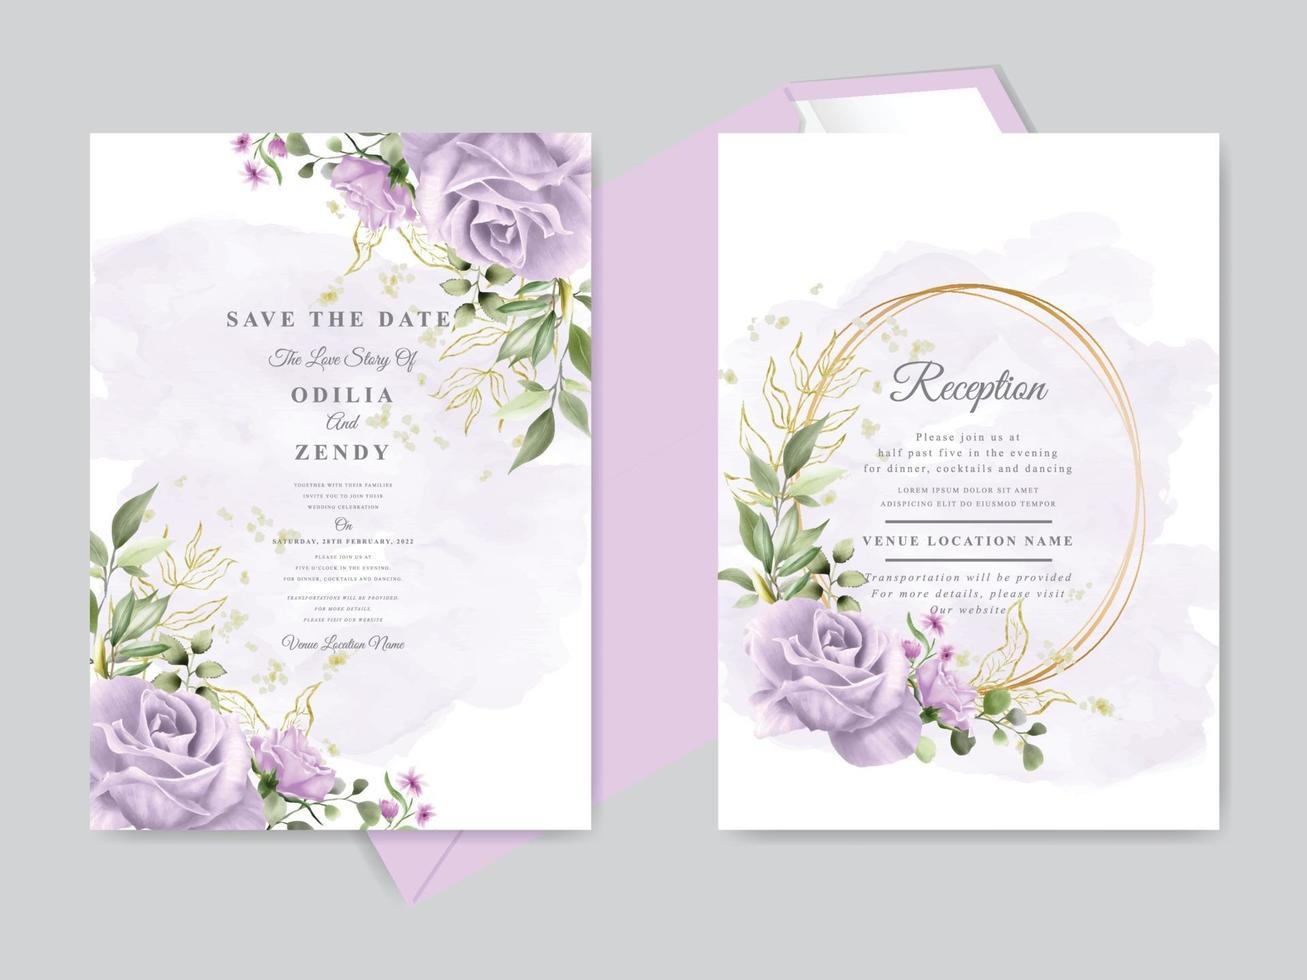 https fr vecteezy com art vectoriel 2133910 ensemble de modeles de cartes d invitation de mariage